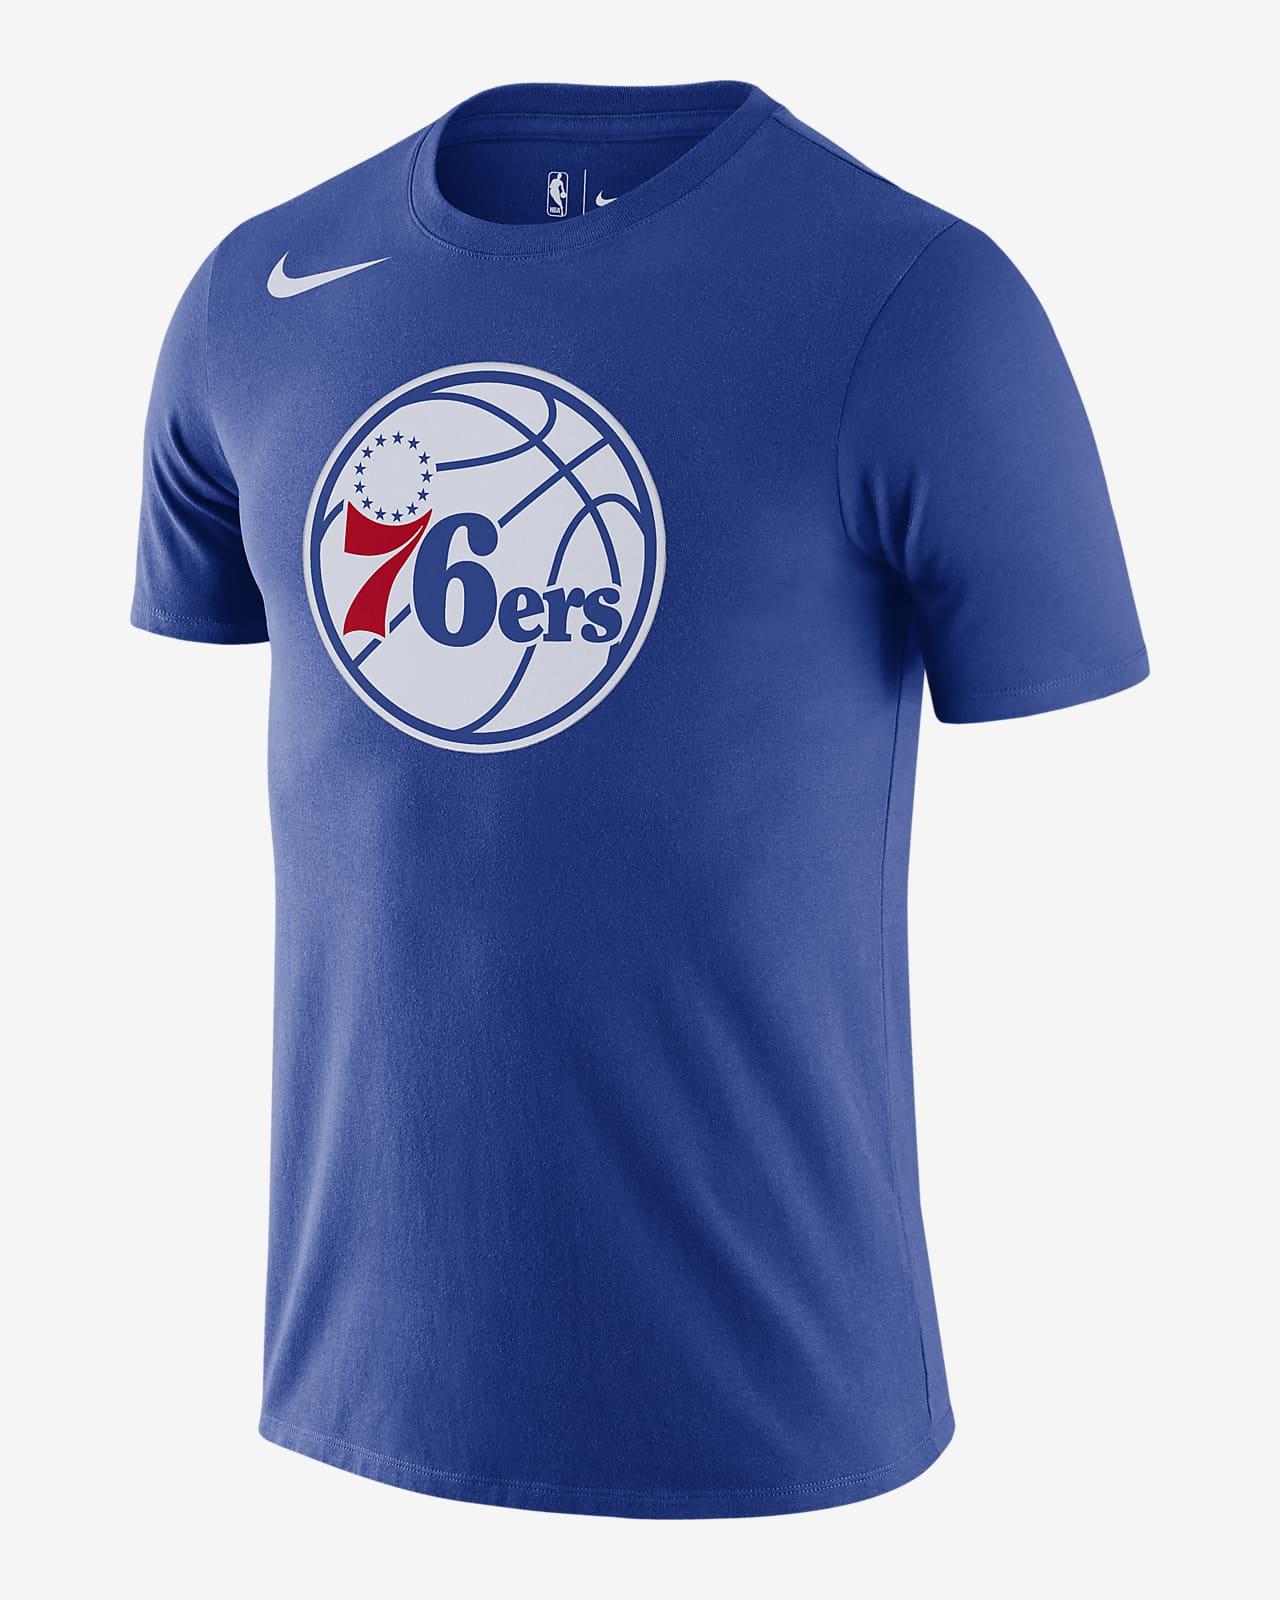 Philadelphia 76ers Nike NBA-herenshirt met logo en Dri-FIT